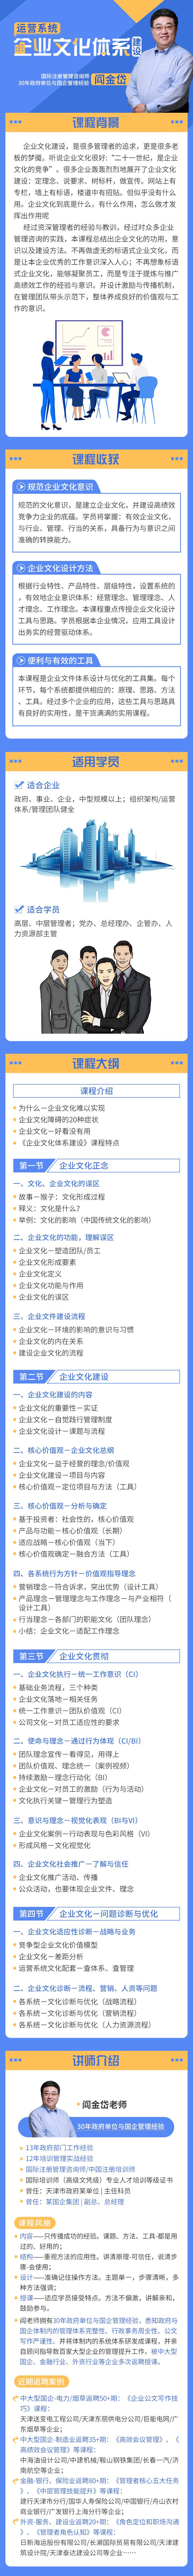 7d9cd5a96e058256baeb3066e95f87af - 运营系统——企业文化体系建设